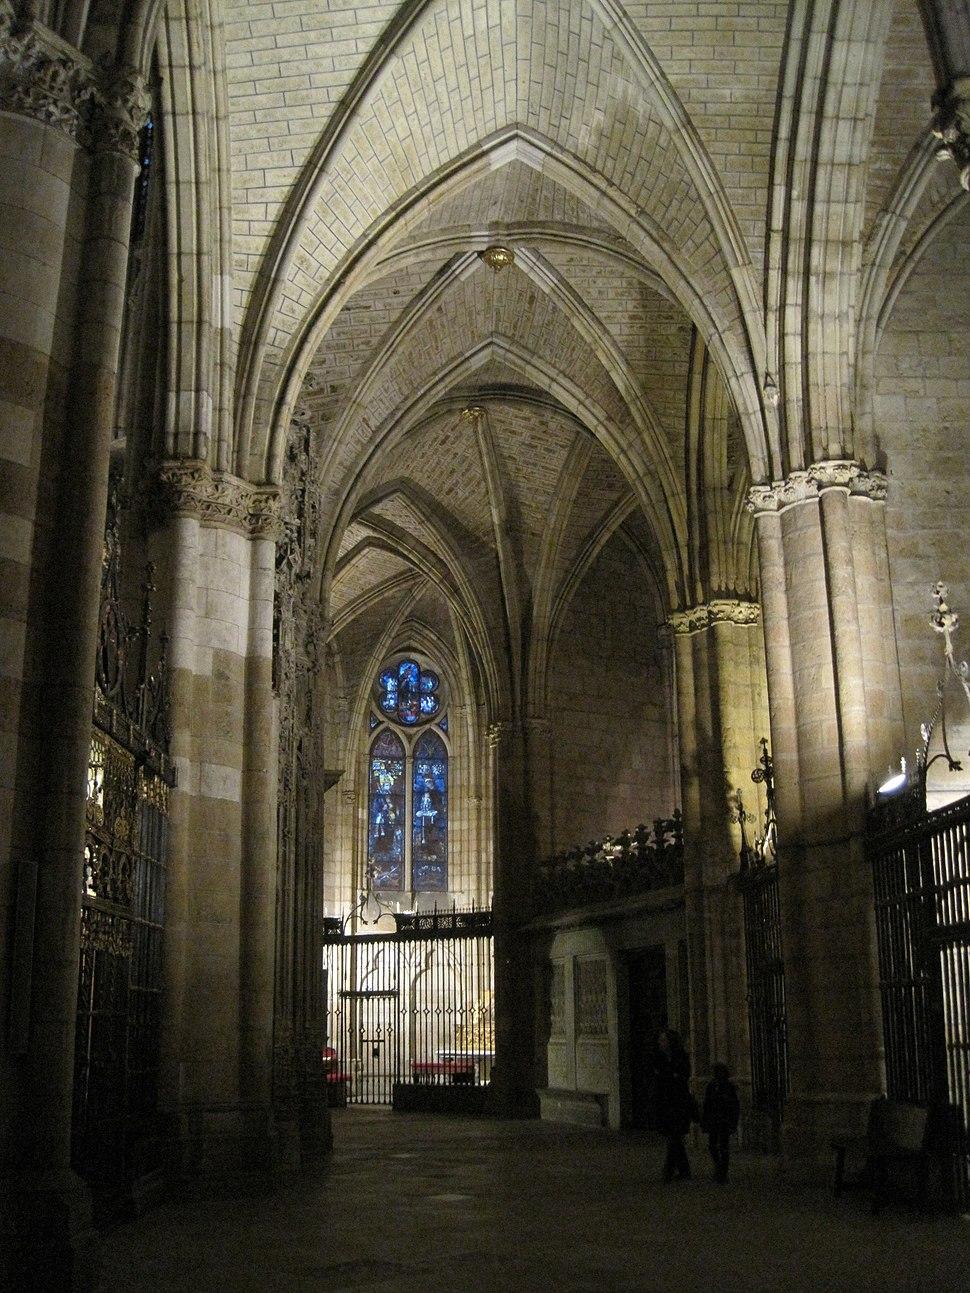 Girola de la catedral de León